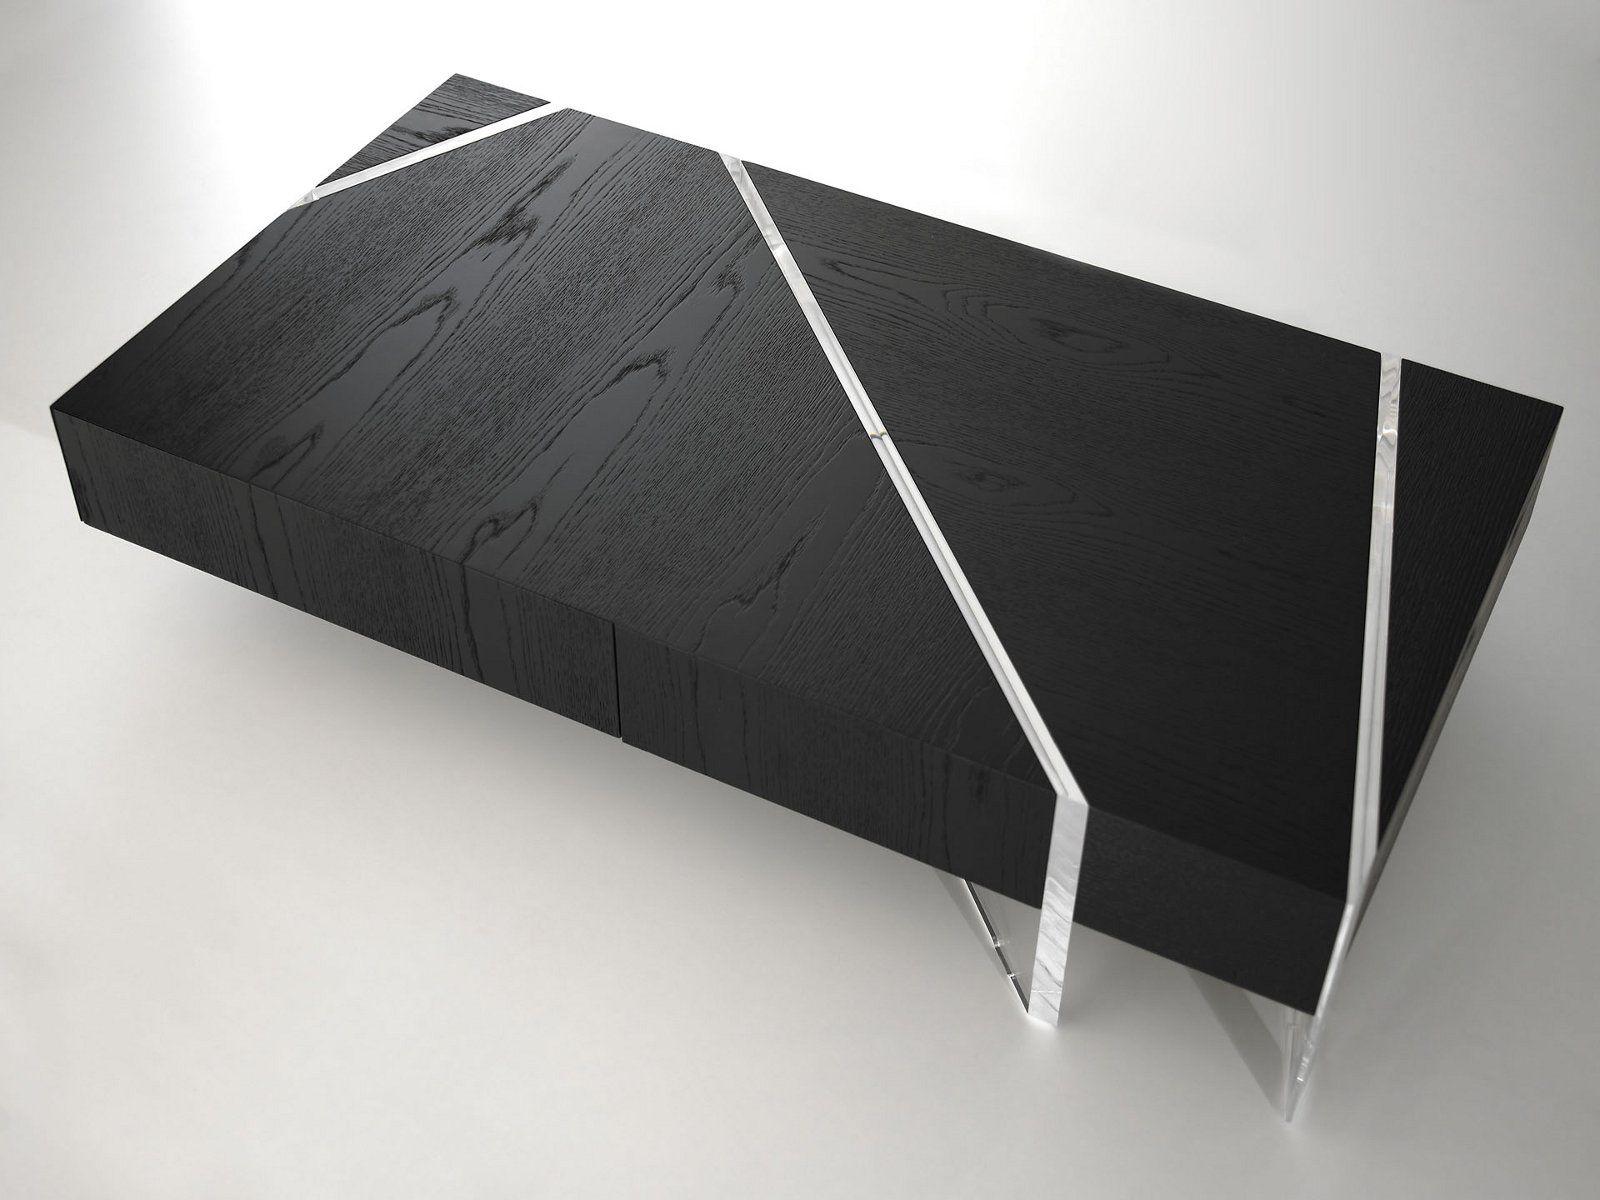 Low rectangular coffee table kristal turriniby home low rectangular coffee table kristal turriniby geotapseo Choice Image